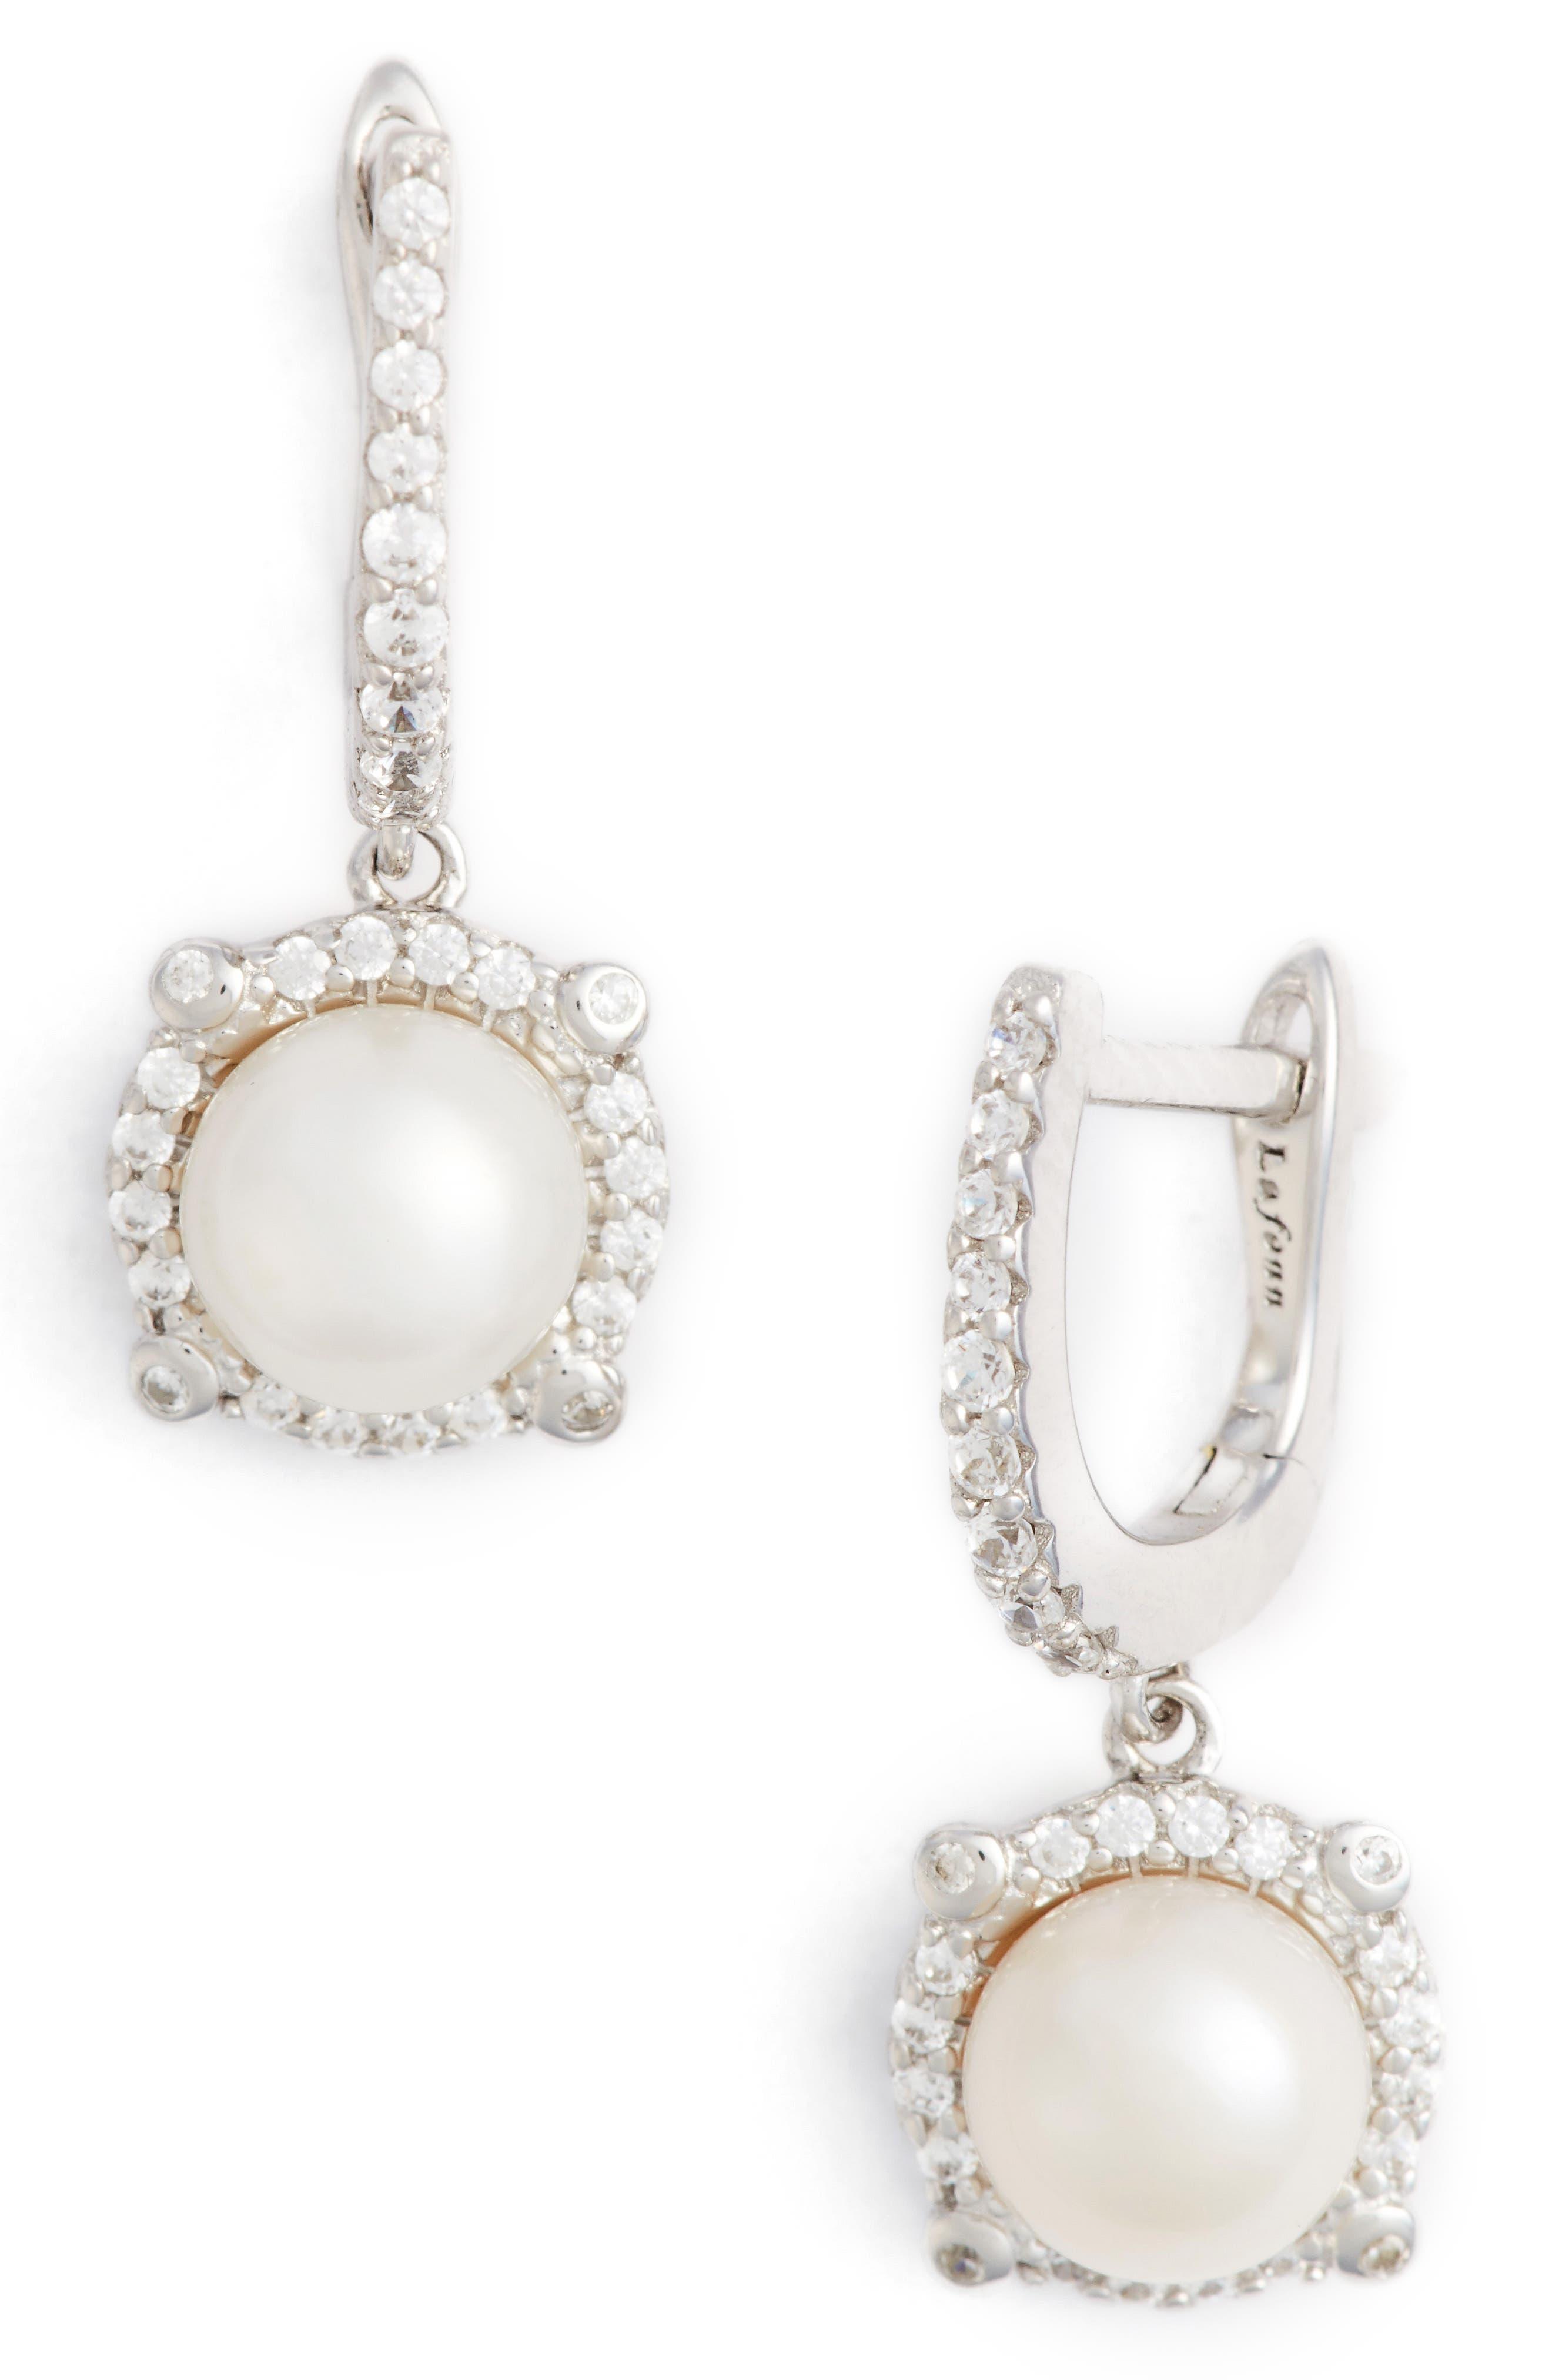 Simulated Diamond & Pearl Drop Earrings,                             Main thumbnail 1, color,                             Silver/ Pearl/ Clear